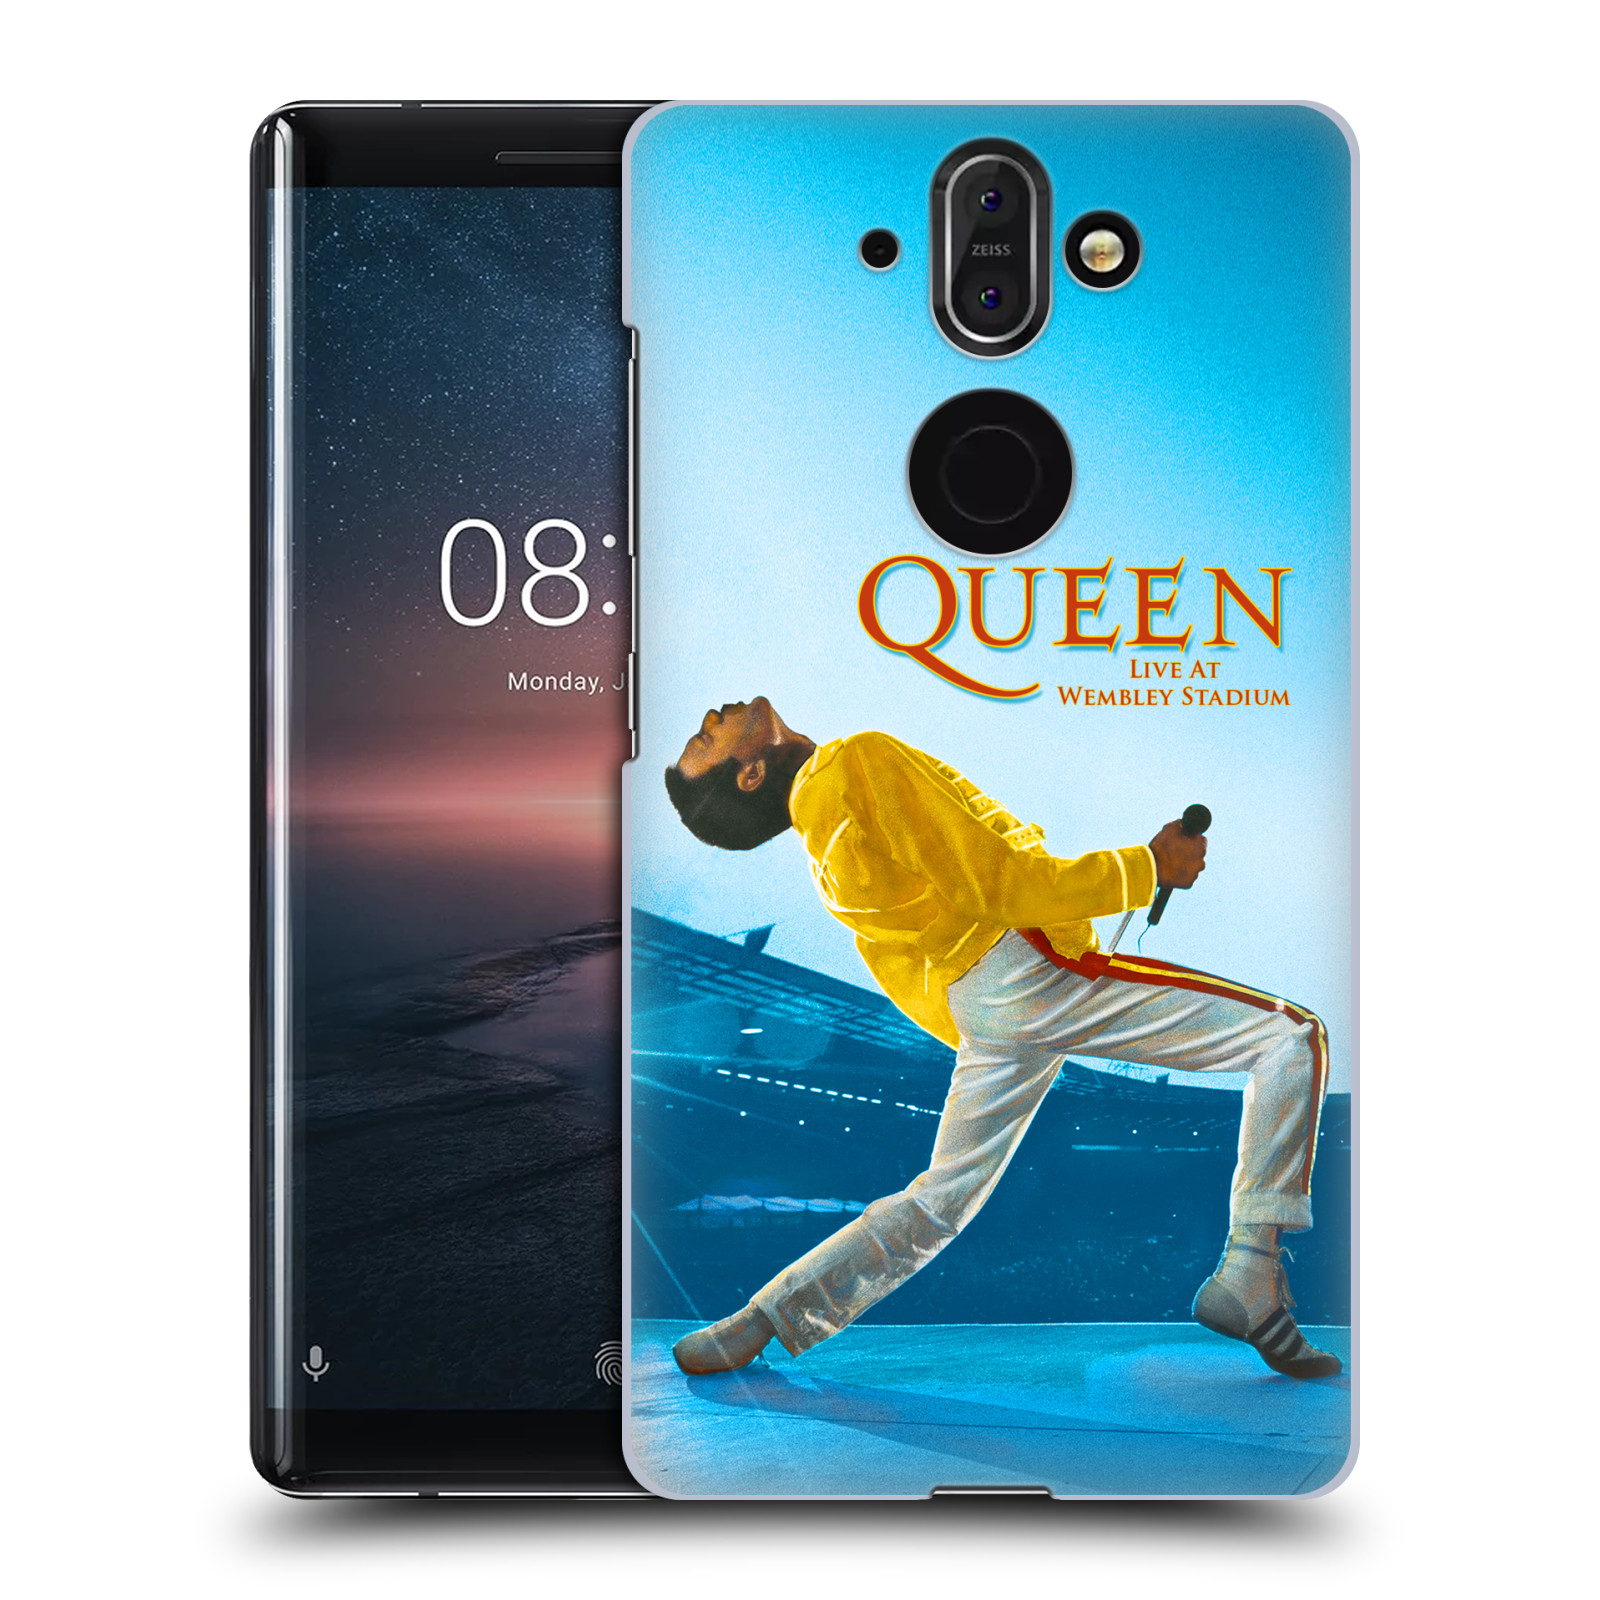 Plastové pouzdro na mobil Nokia 8 Sirocco - Head Case - Queen - Freddie Mercury